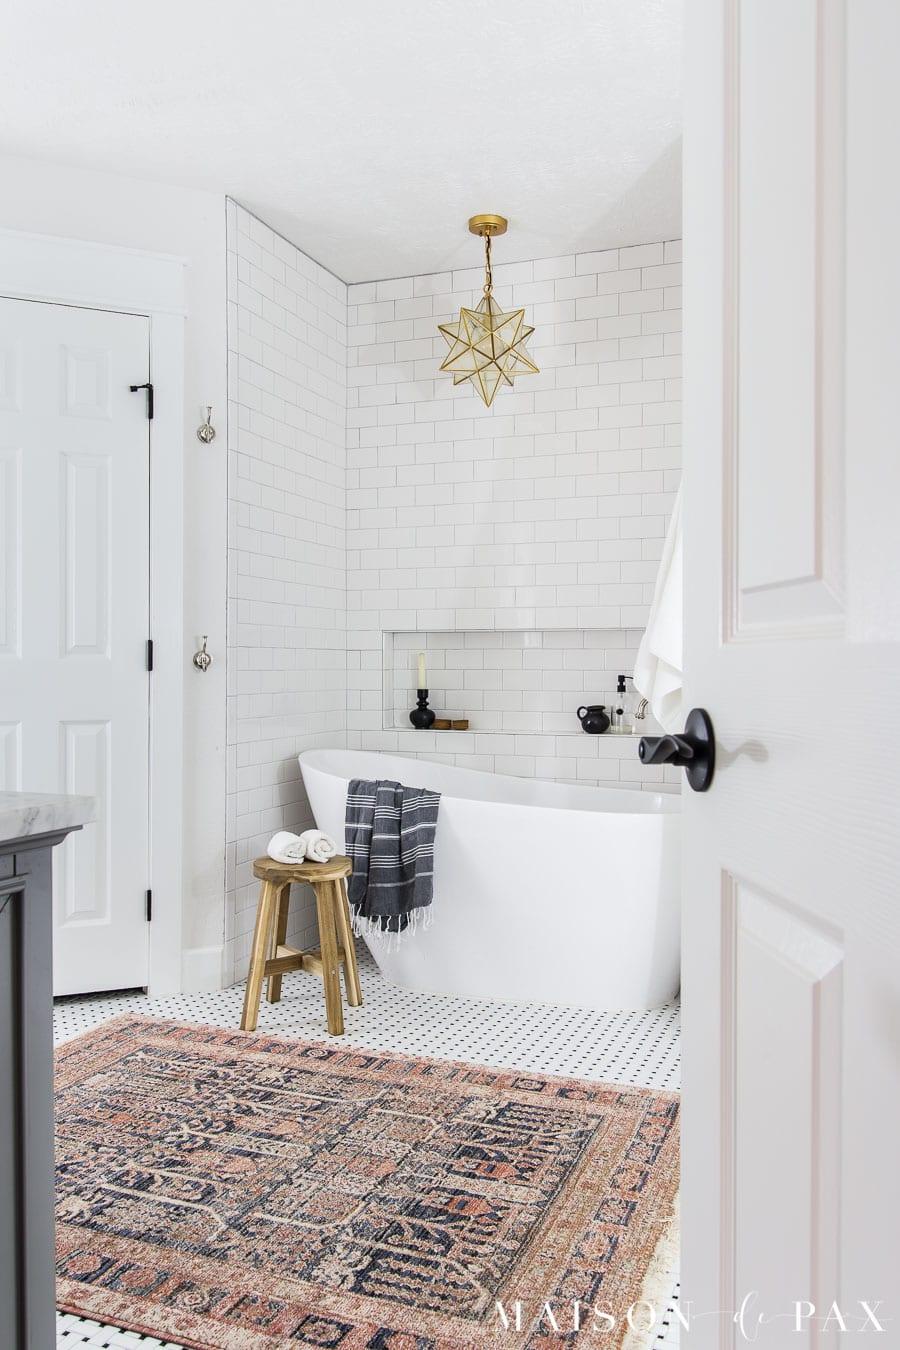 subway tile bathroom with black and white basketweave floor tile